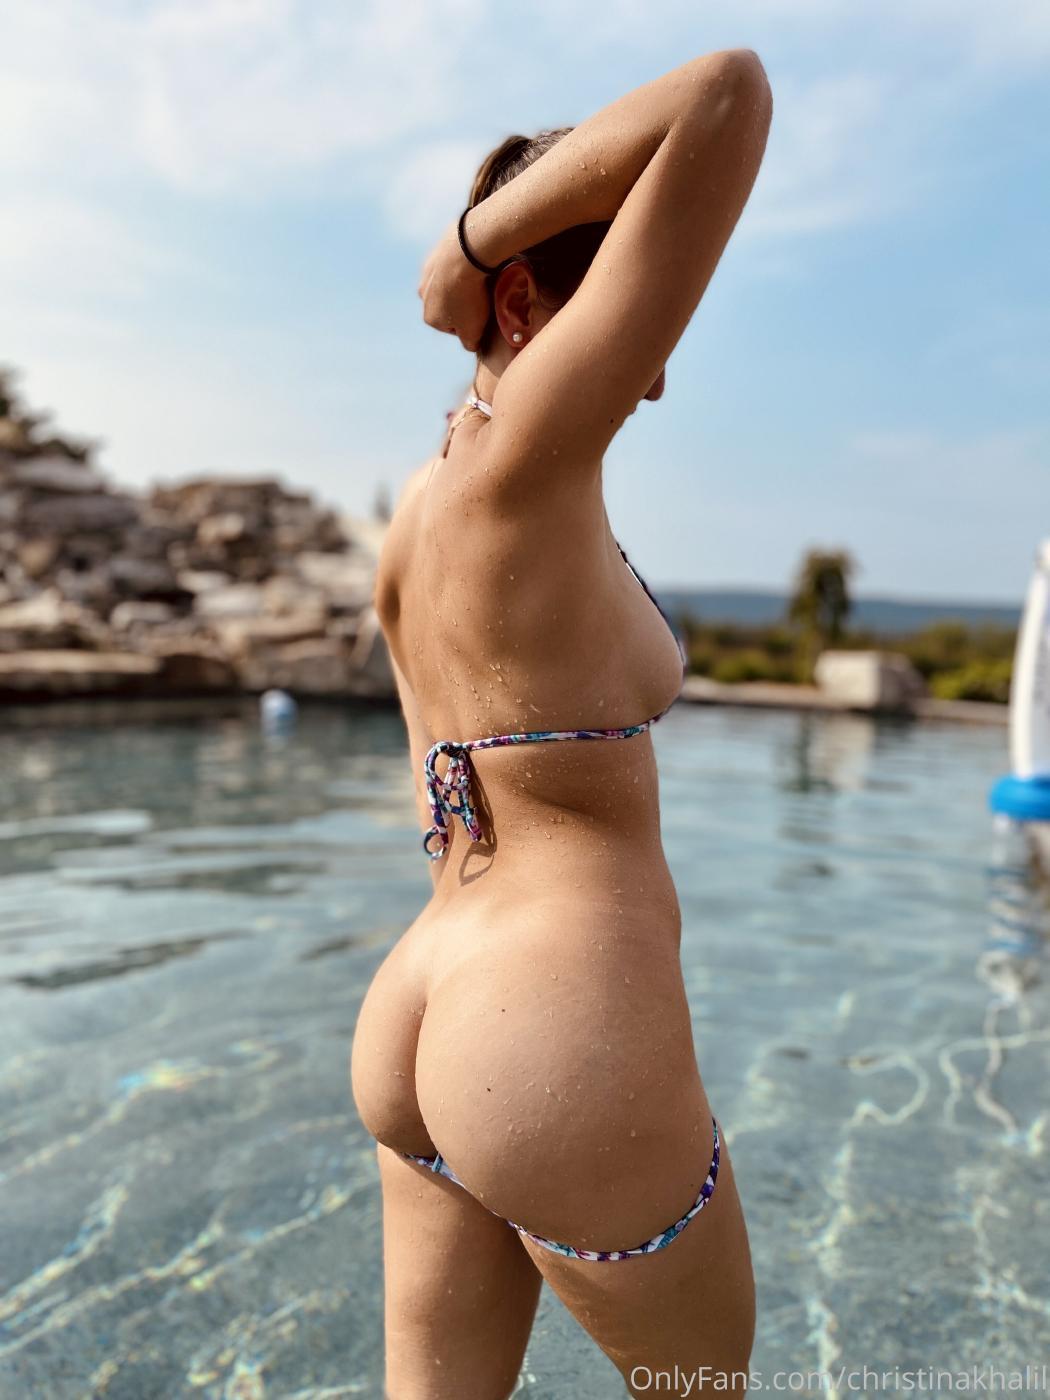 Christina Khalil Topless Pool Onlyfans Set Leaked Dnudhg